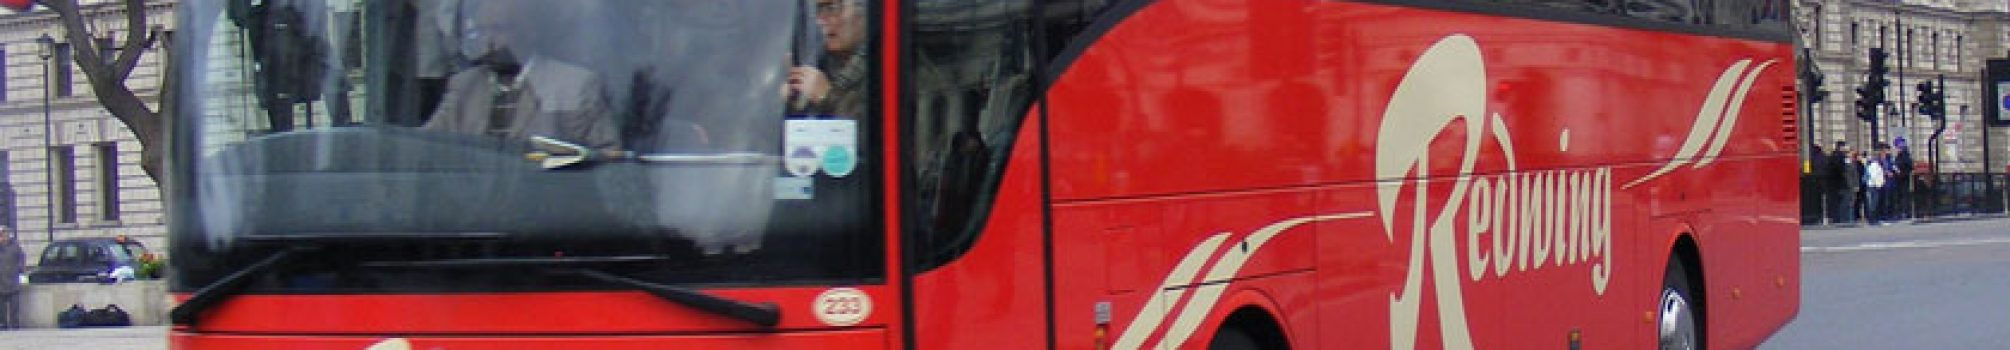 redwings-coach